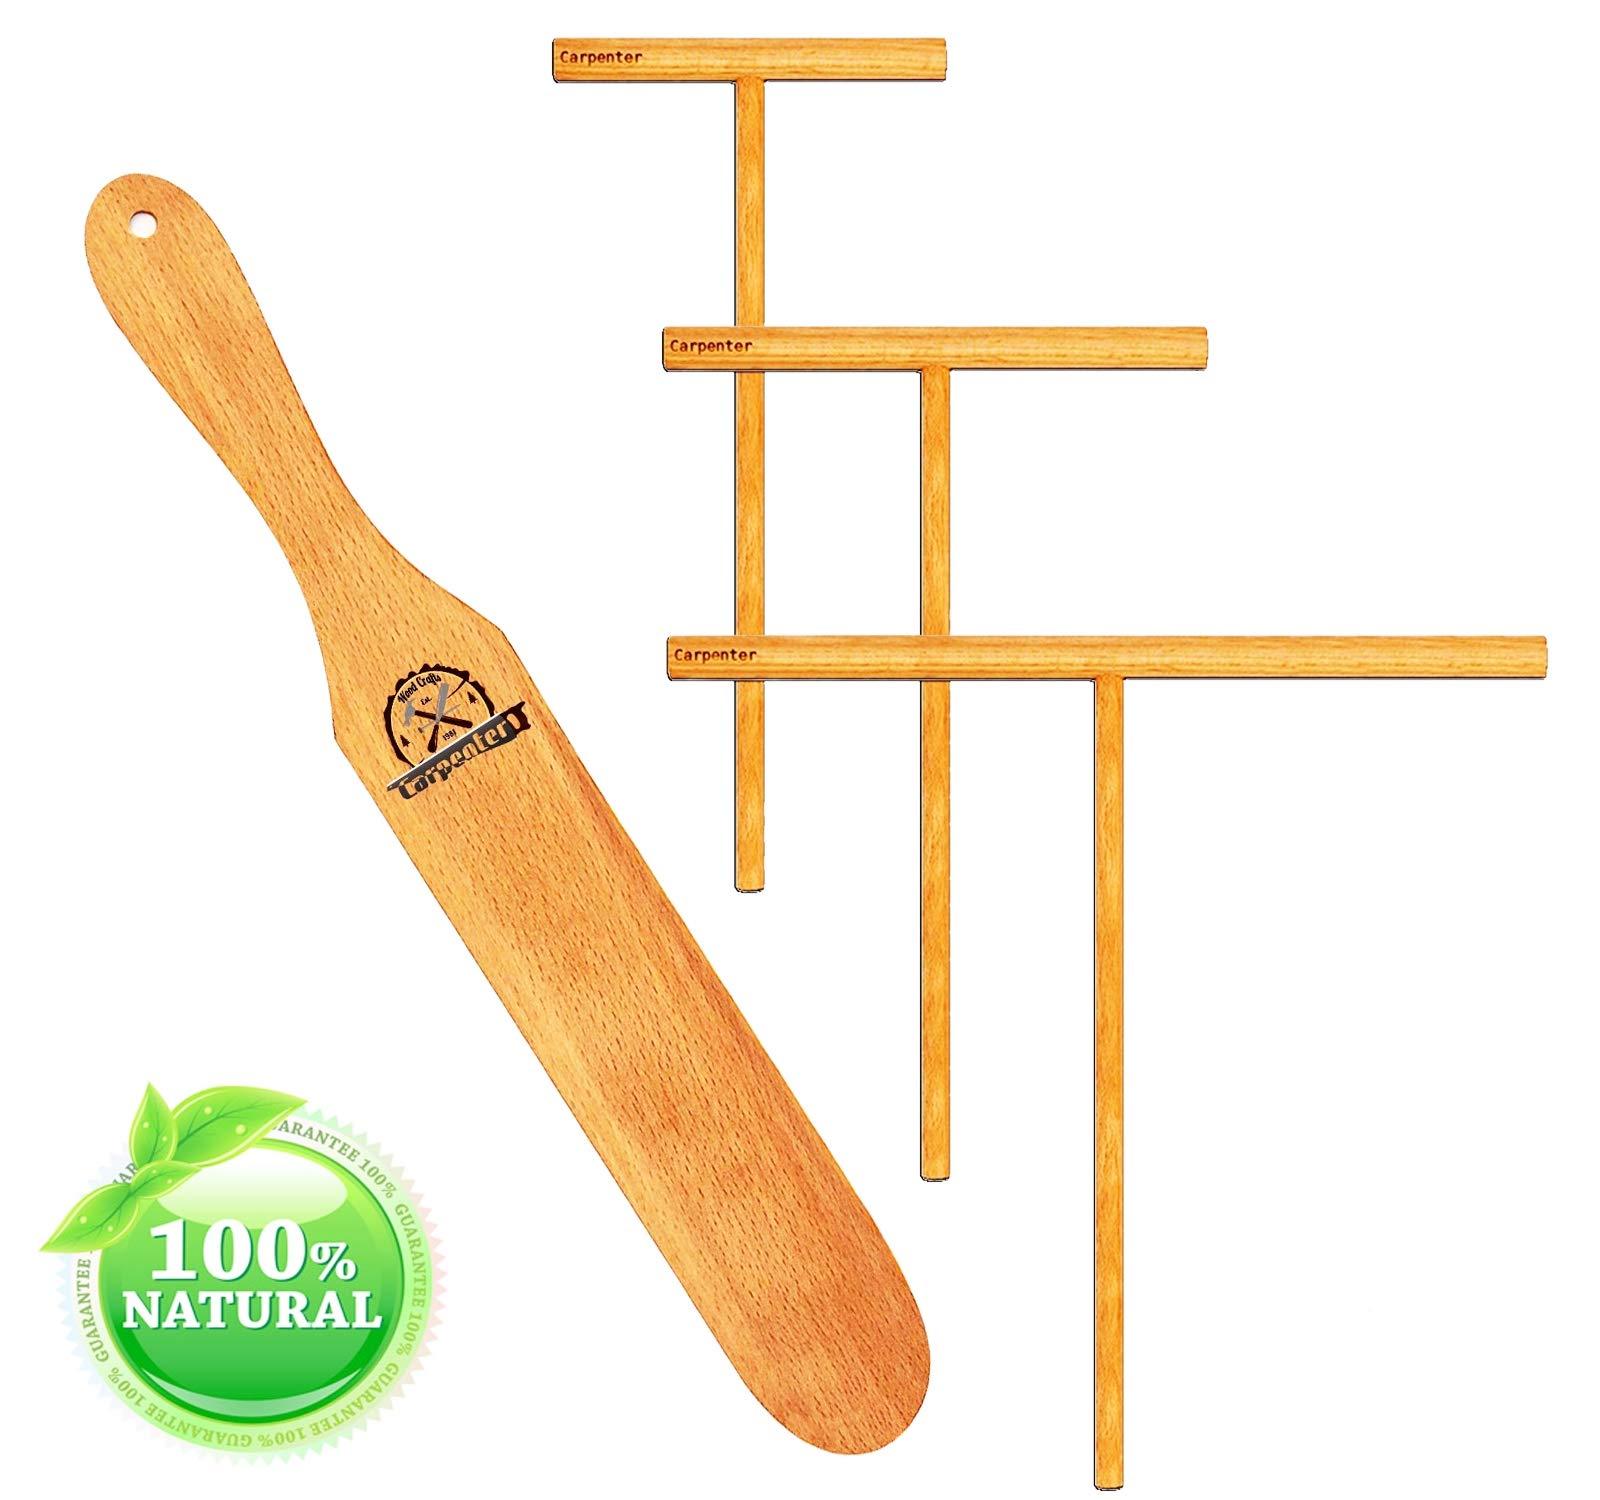 Crepe Spreaders - Spatula & Spreaders 3 Set - Handmade Natural Beechwood - 12'' Crepe Spatula [3.5'' 5'' 7'' Spreaders Kit] Spreader Wood Spatula Turner Crepe Breakfast Maker Bamboo Crepe Spreader Pack 4